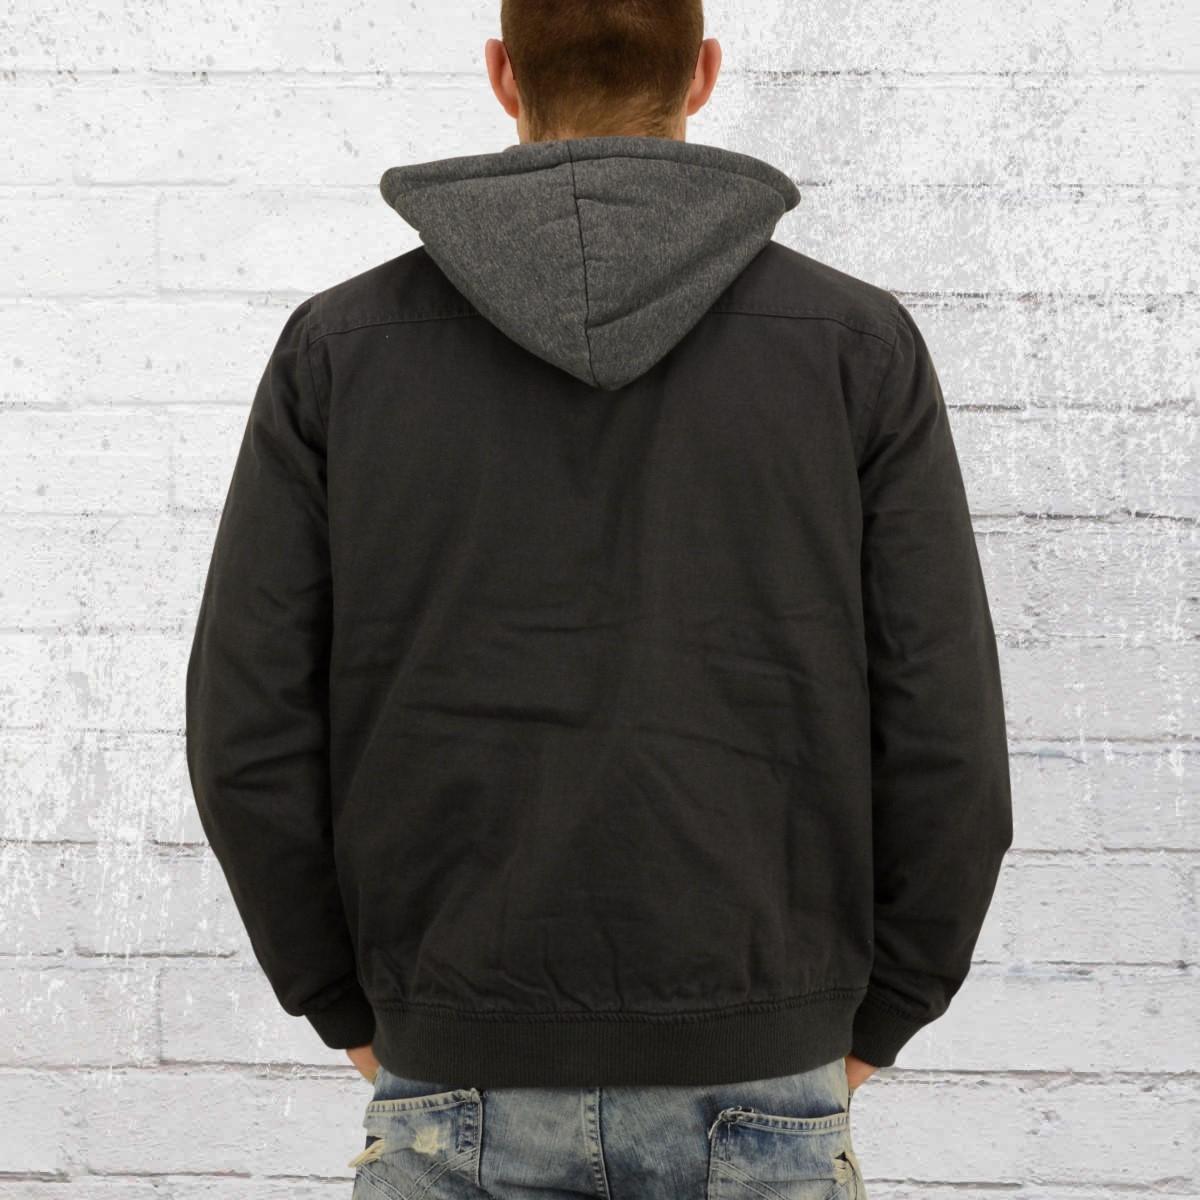 74e236f94 Order now | Billabong Mens Jacket Barlow Twill charcoal